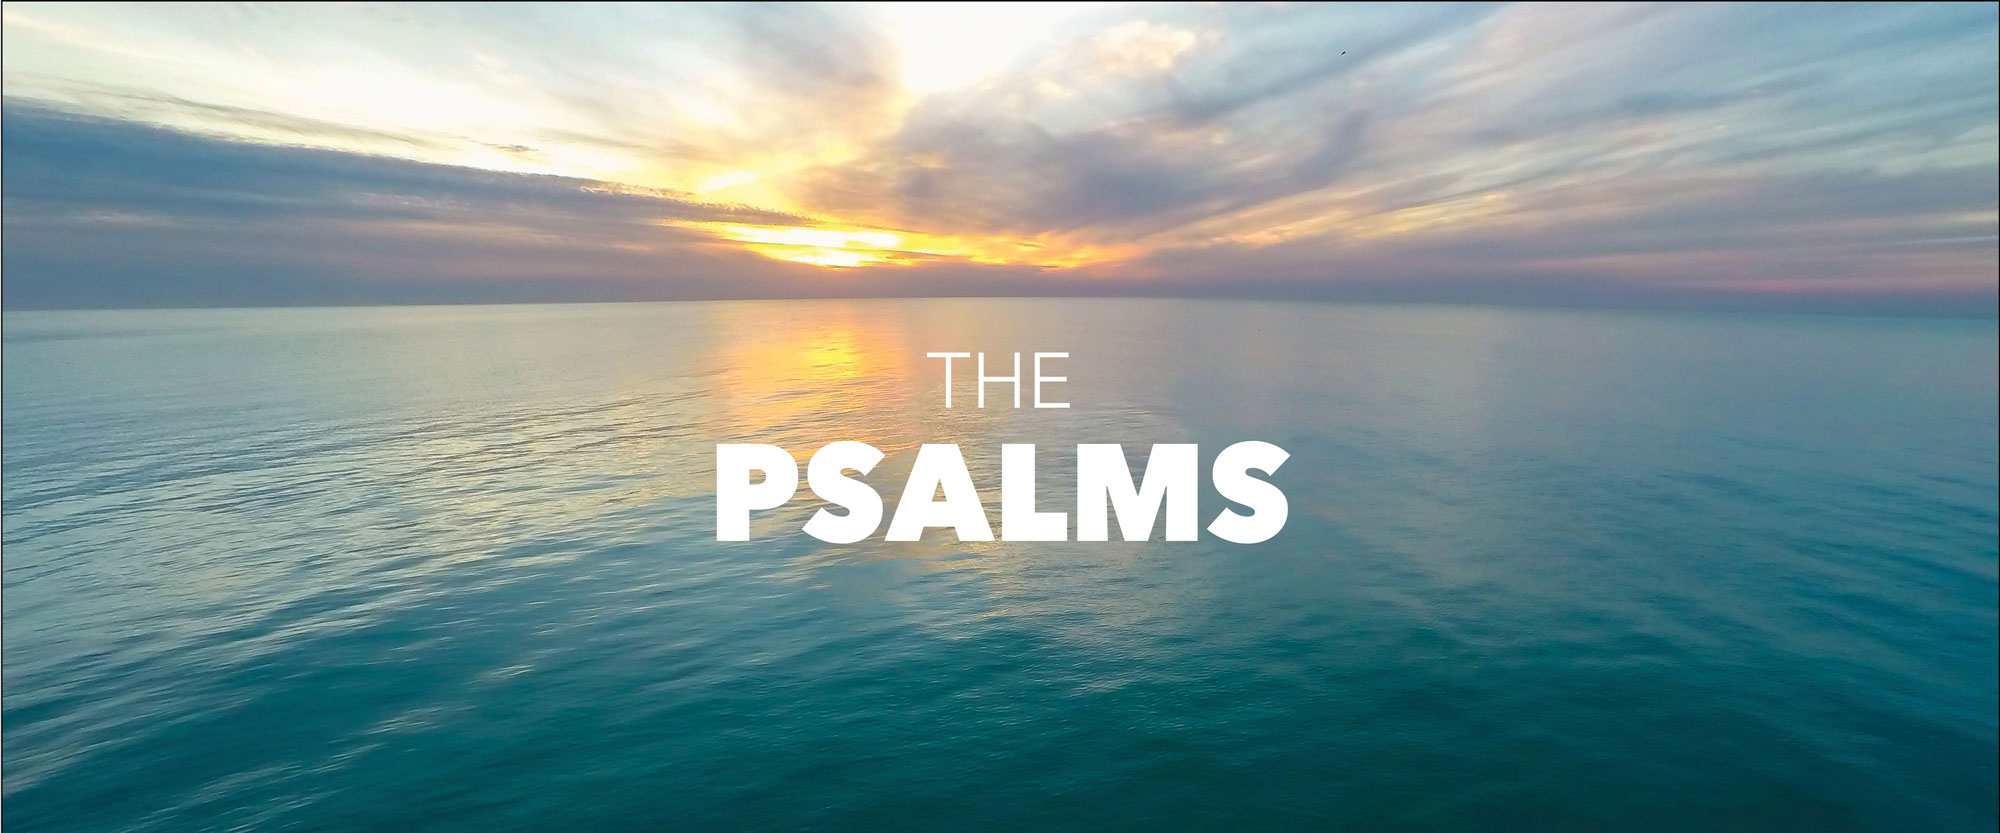 The Psalms – Calvary Chapel Ft Lauderdale